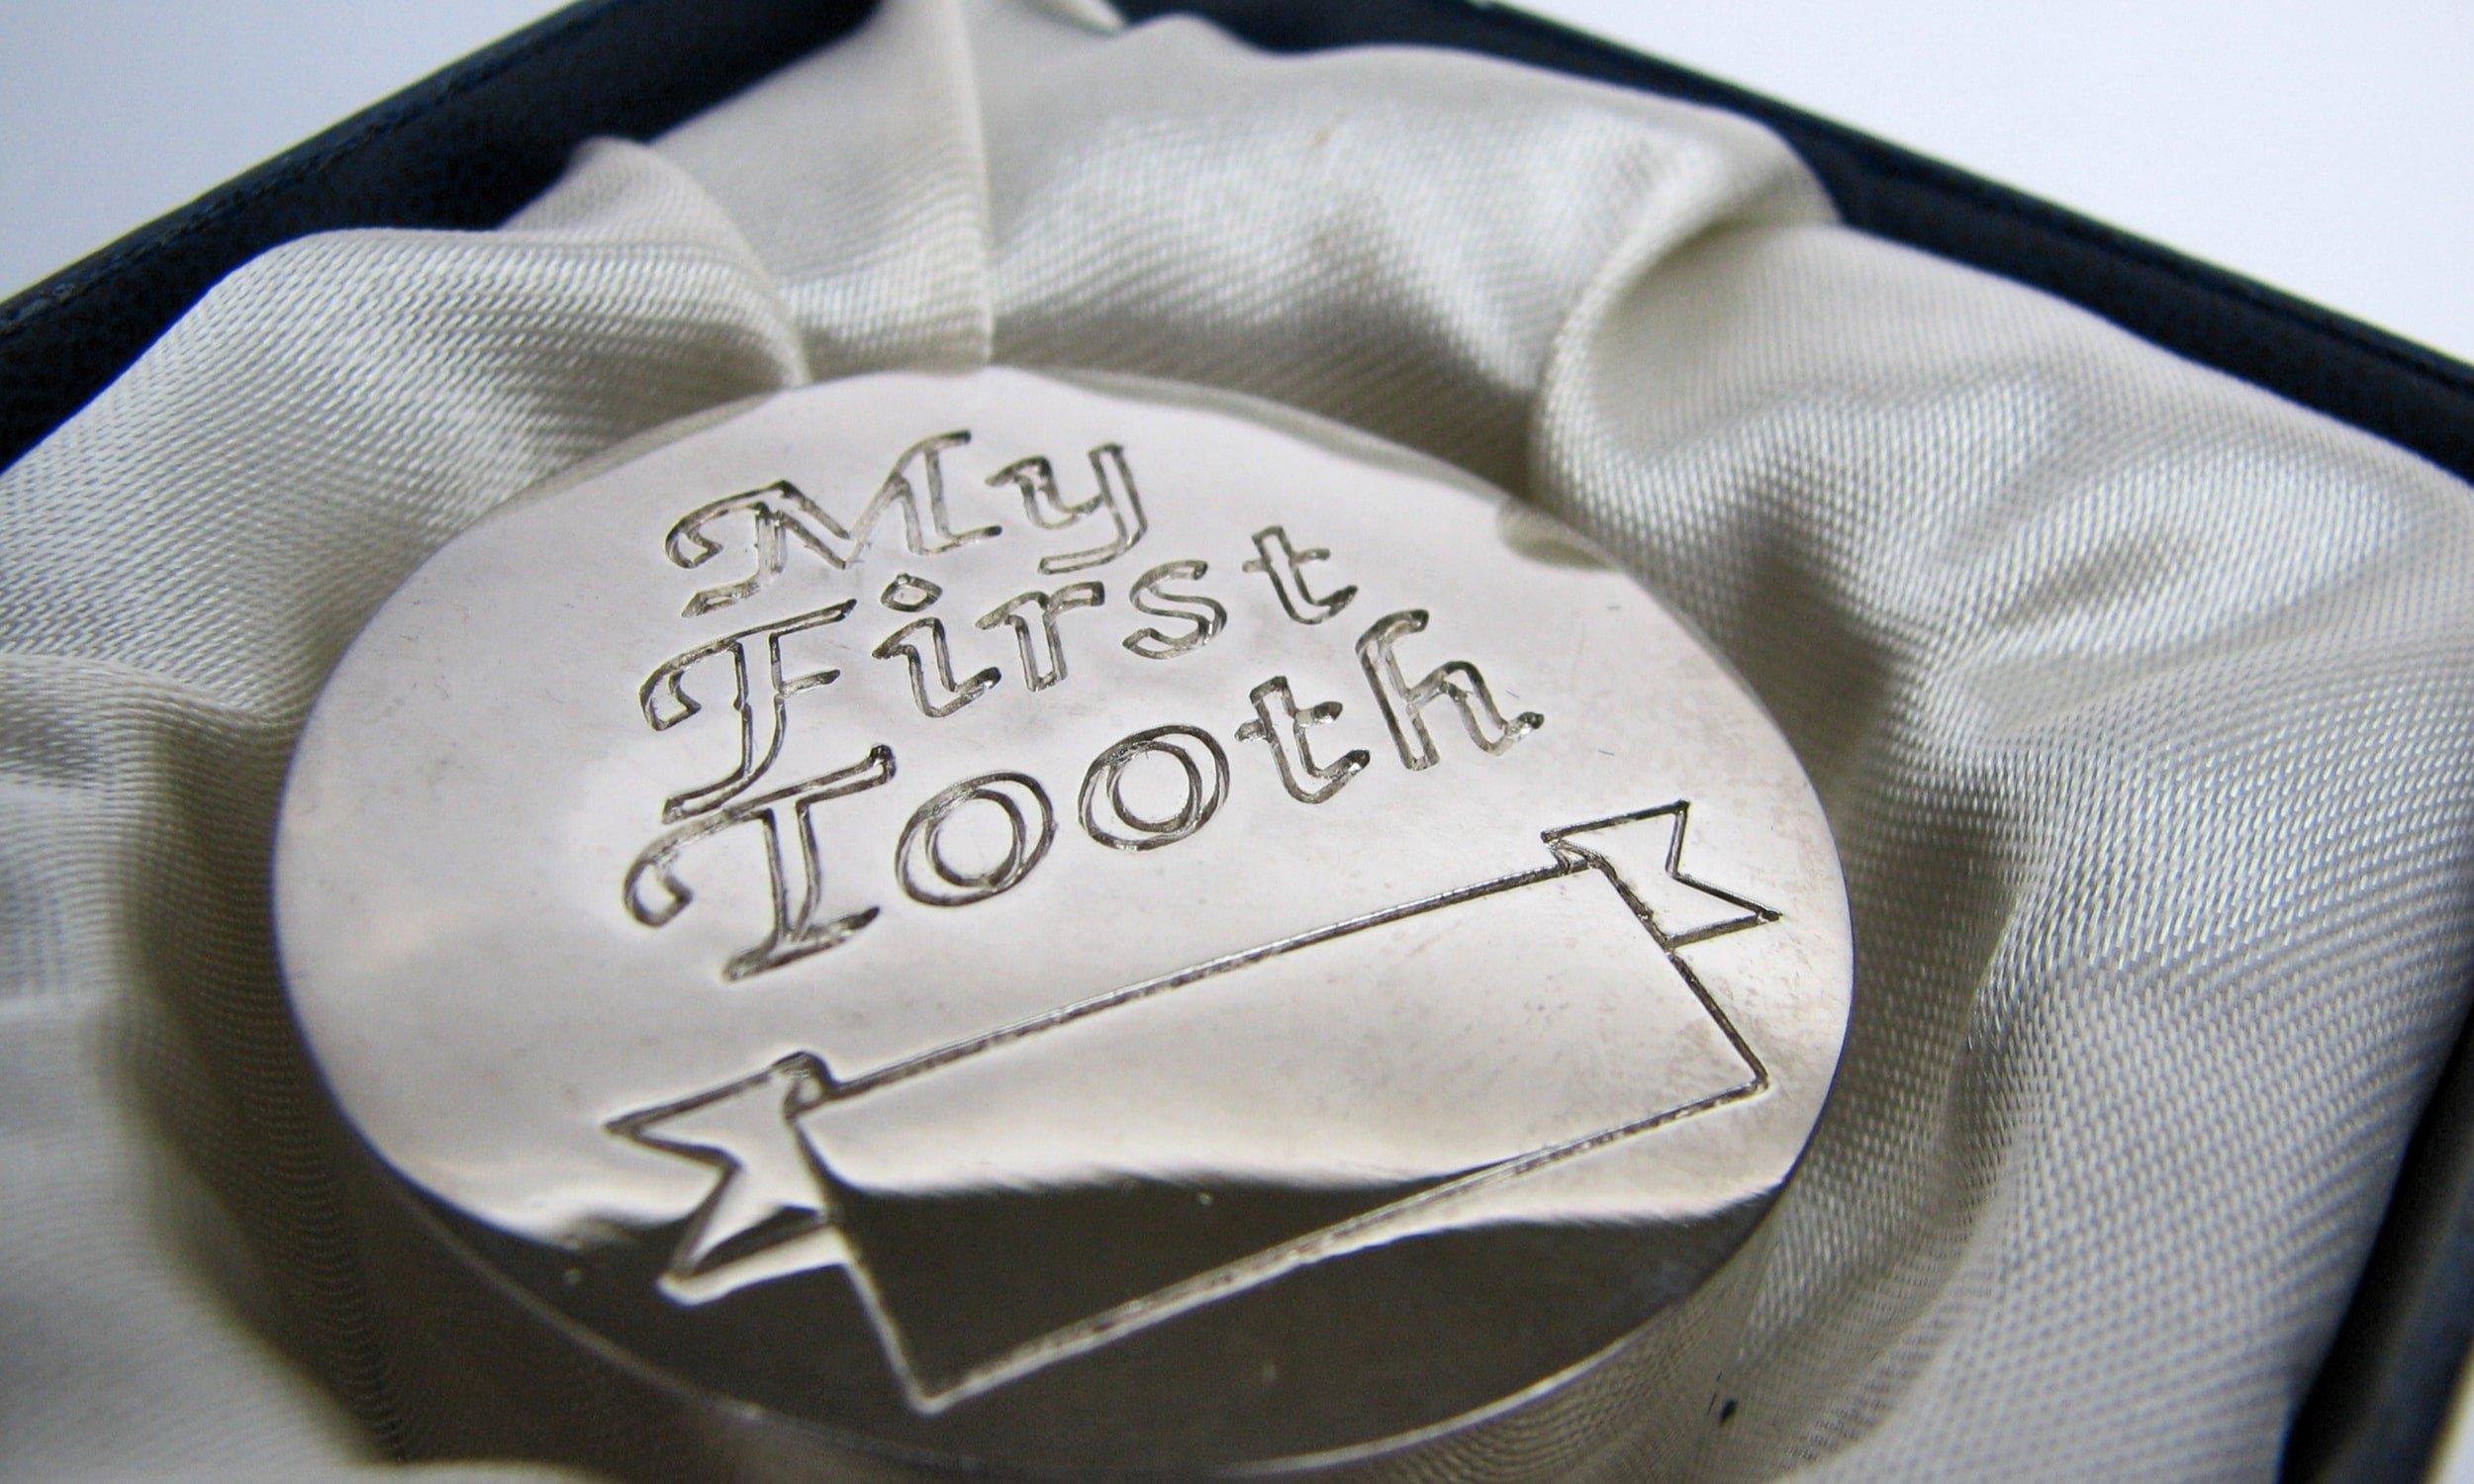 pirmojo dantuko dezute